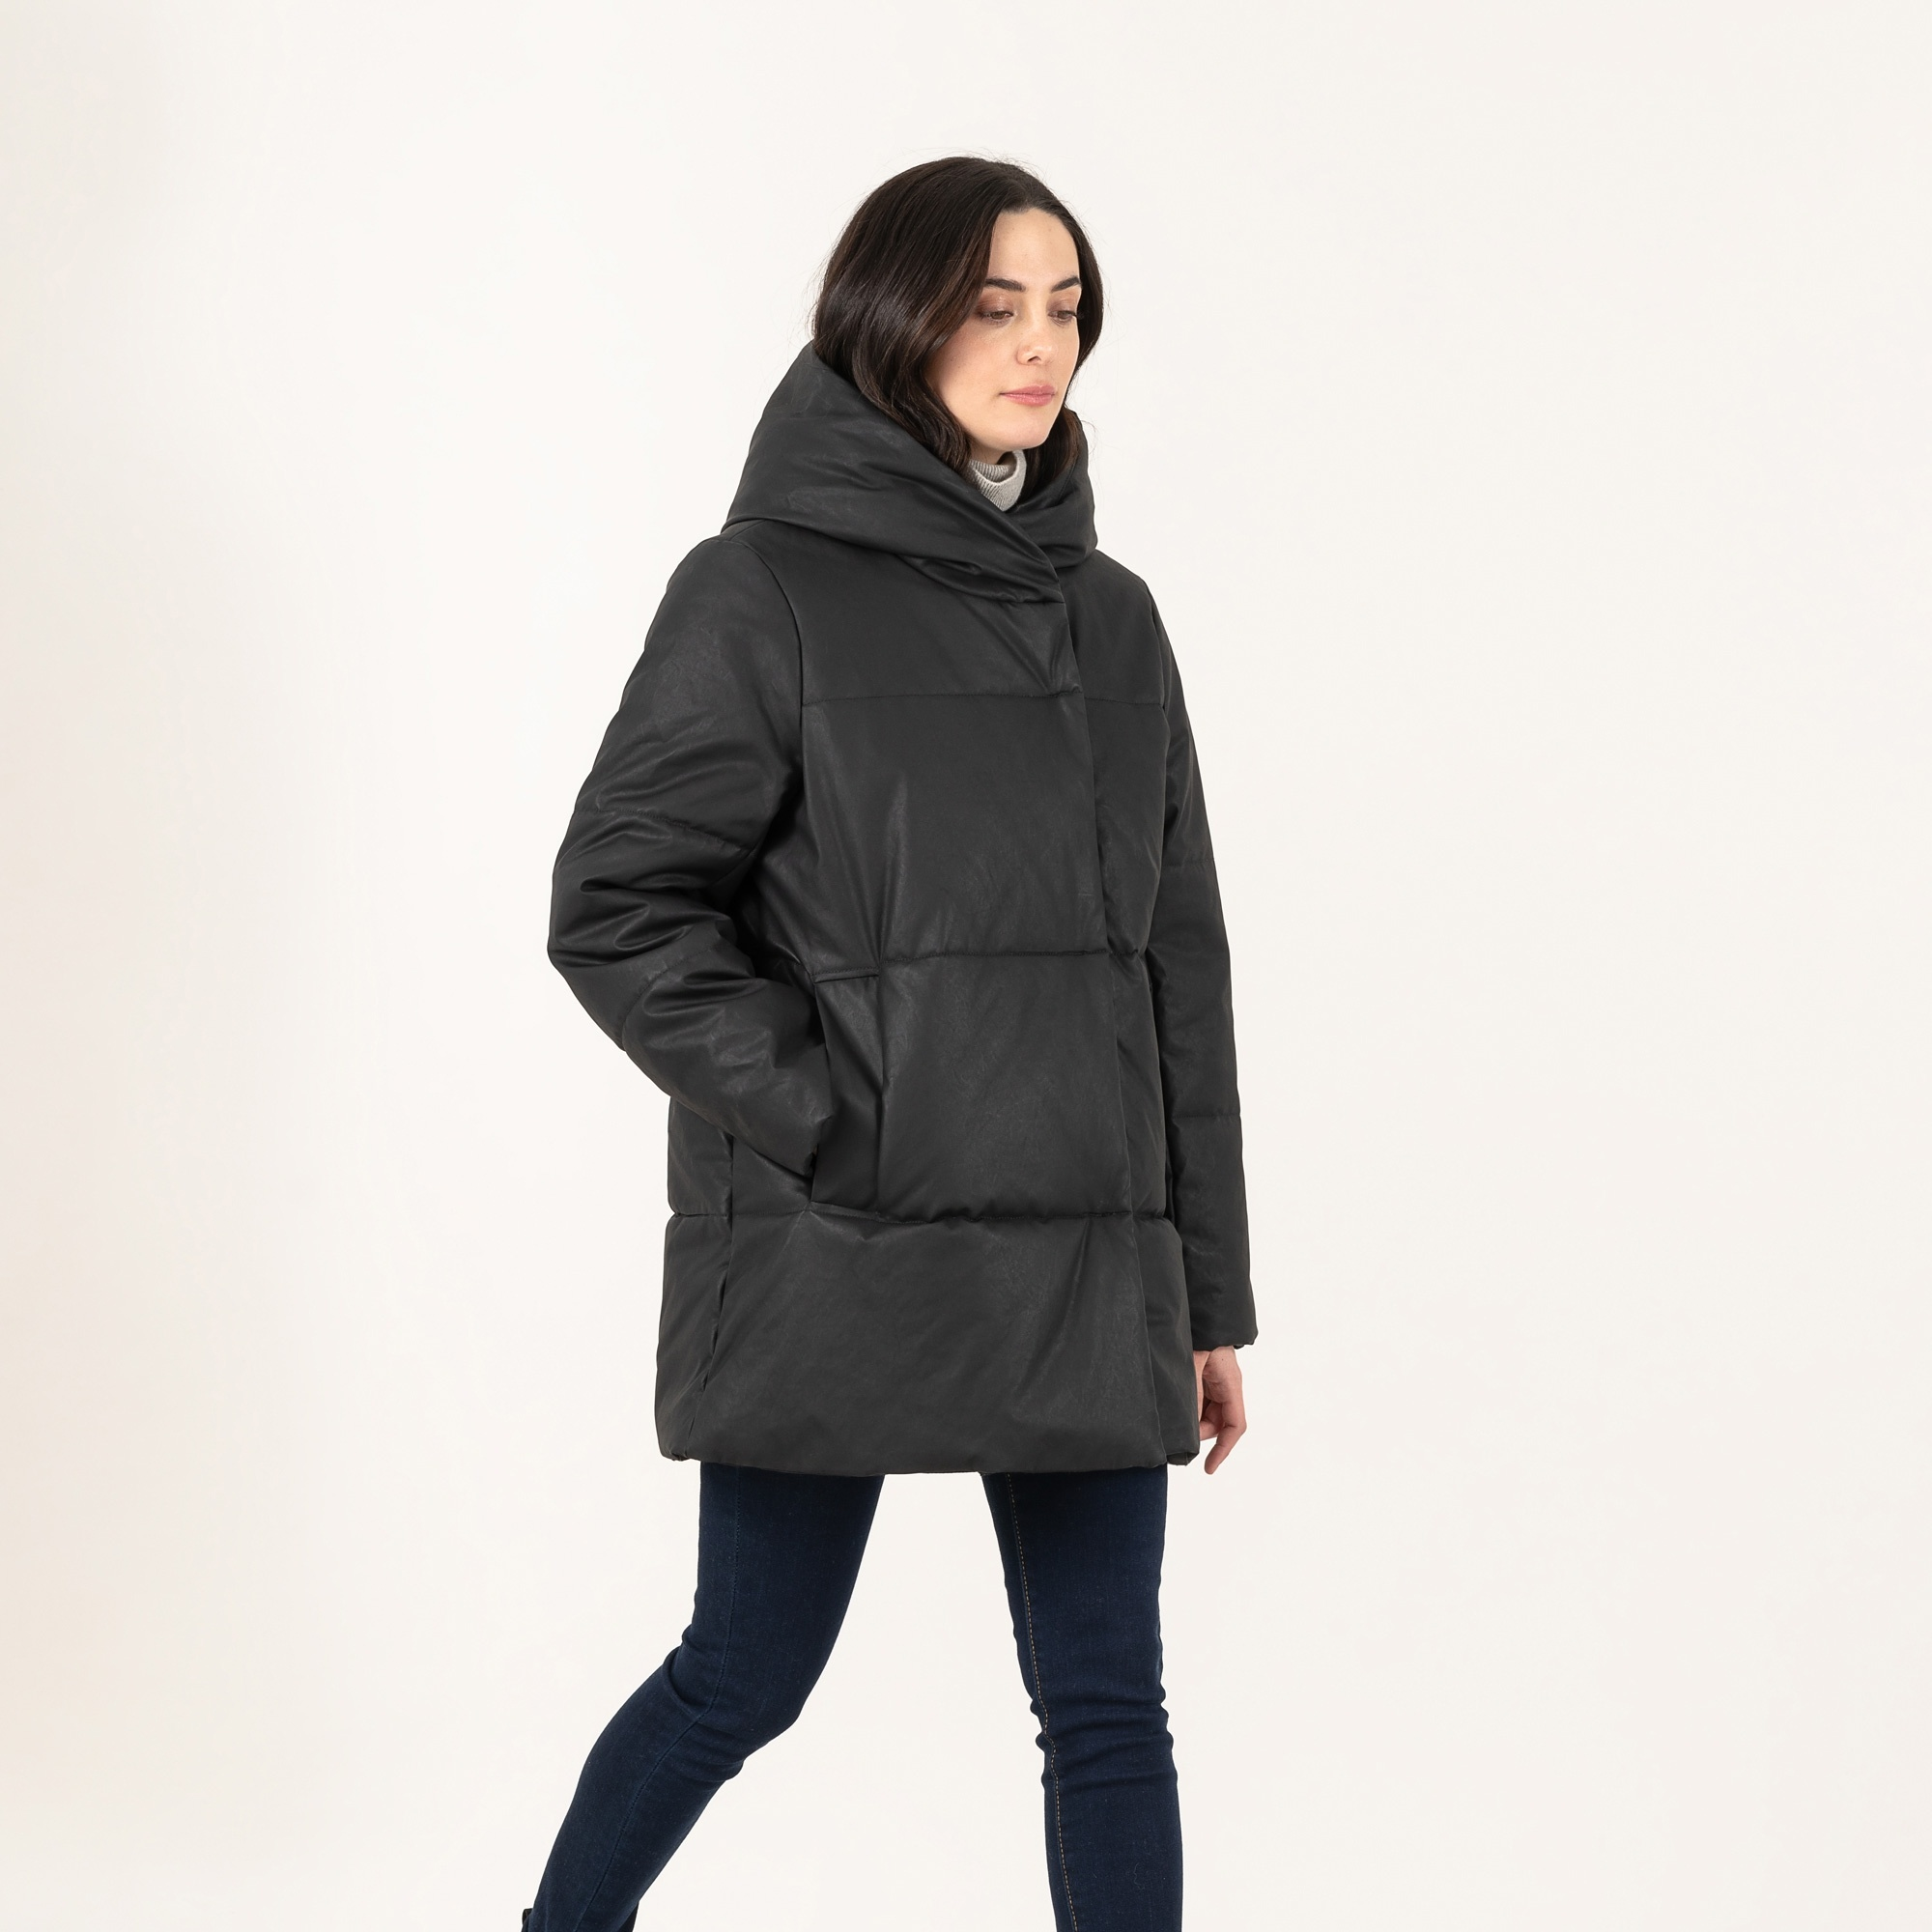 m0851 Quilted Coat 98 06